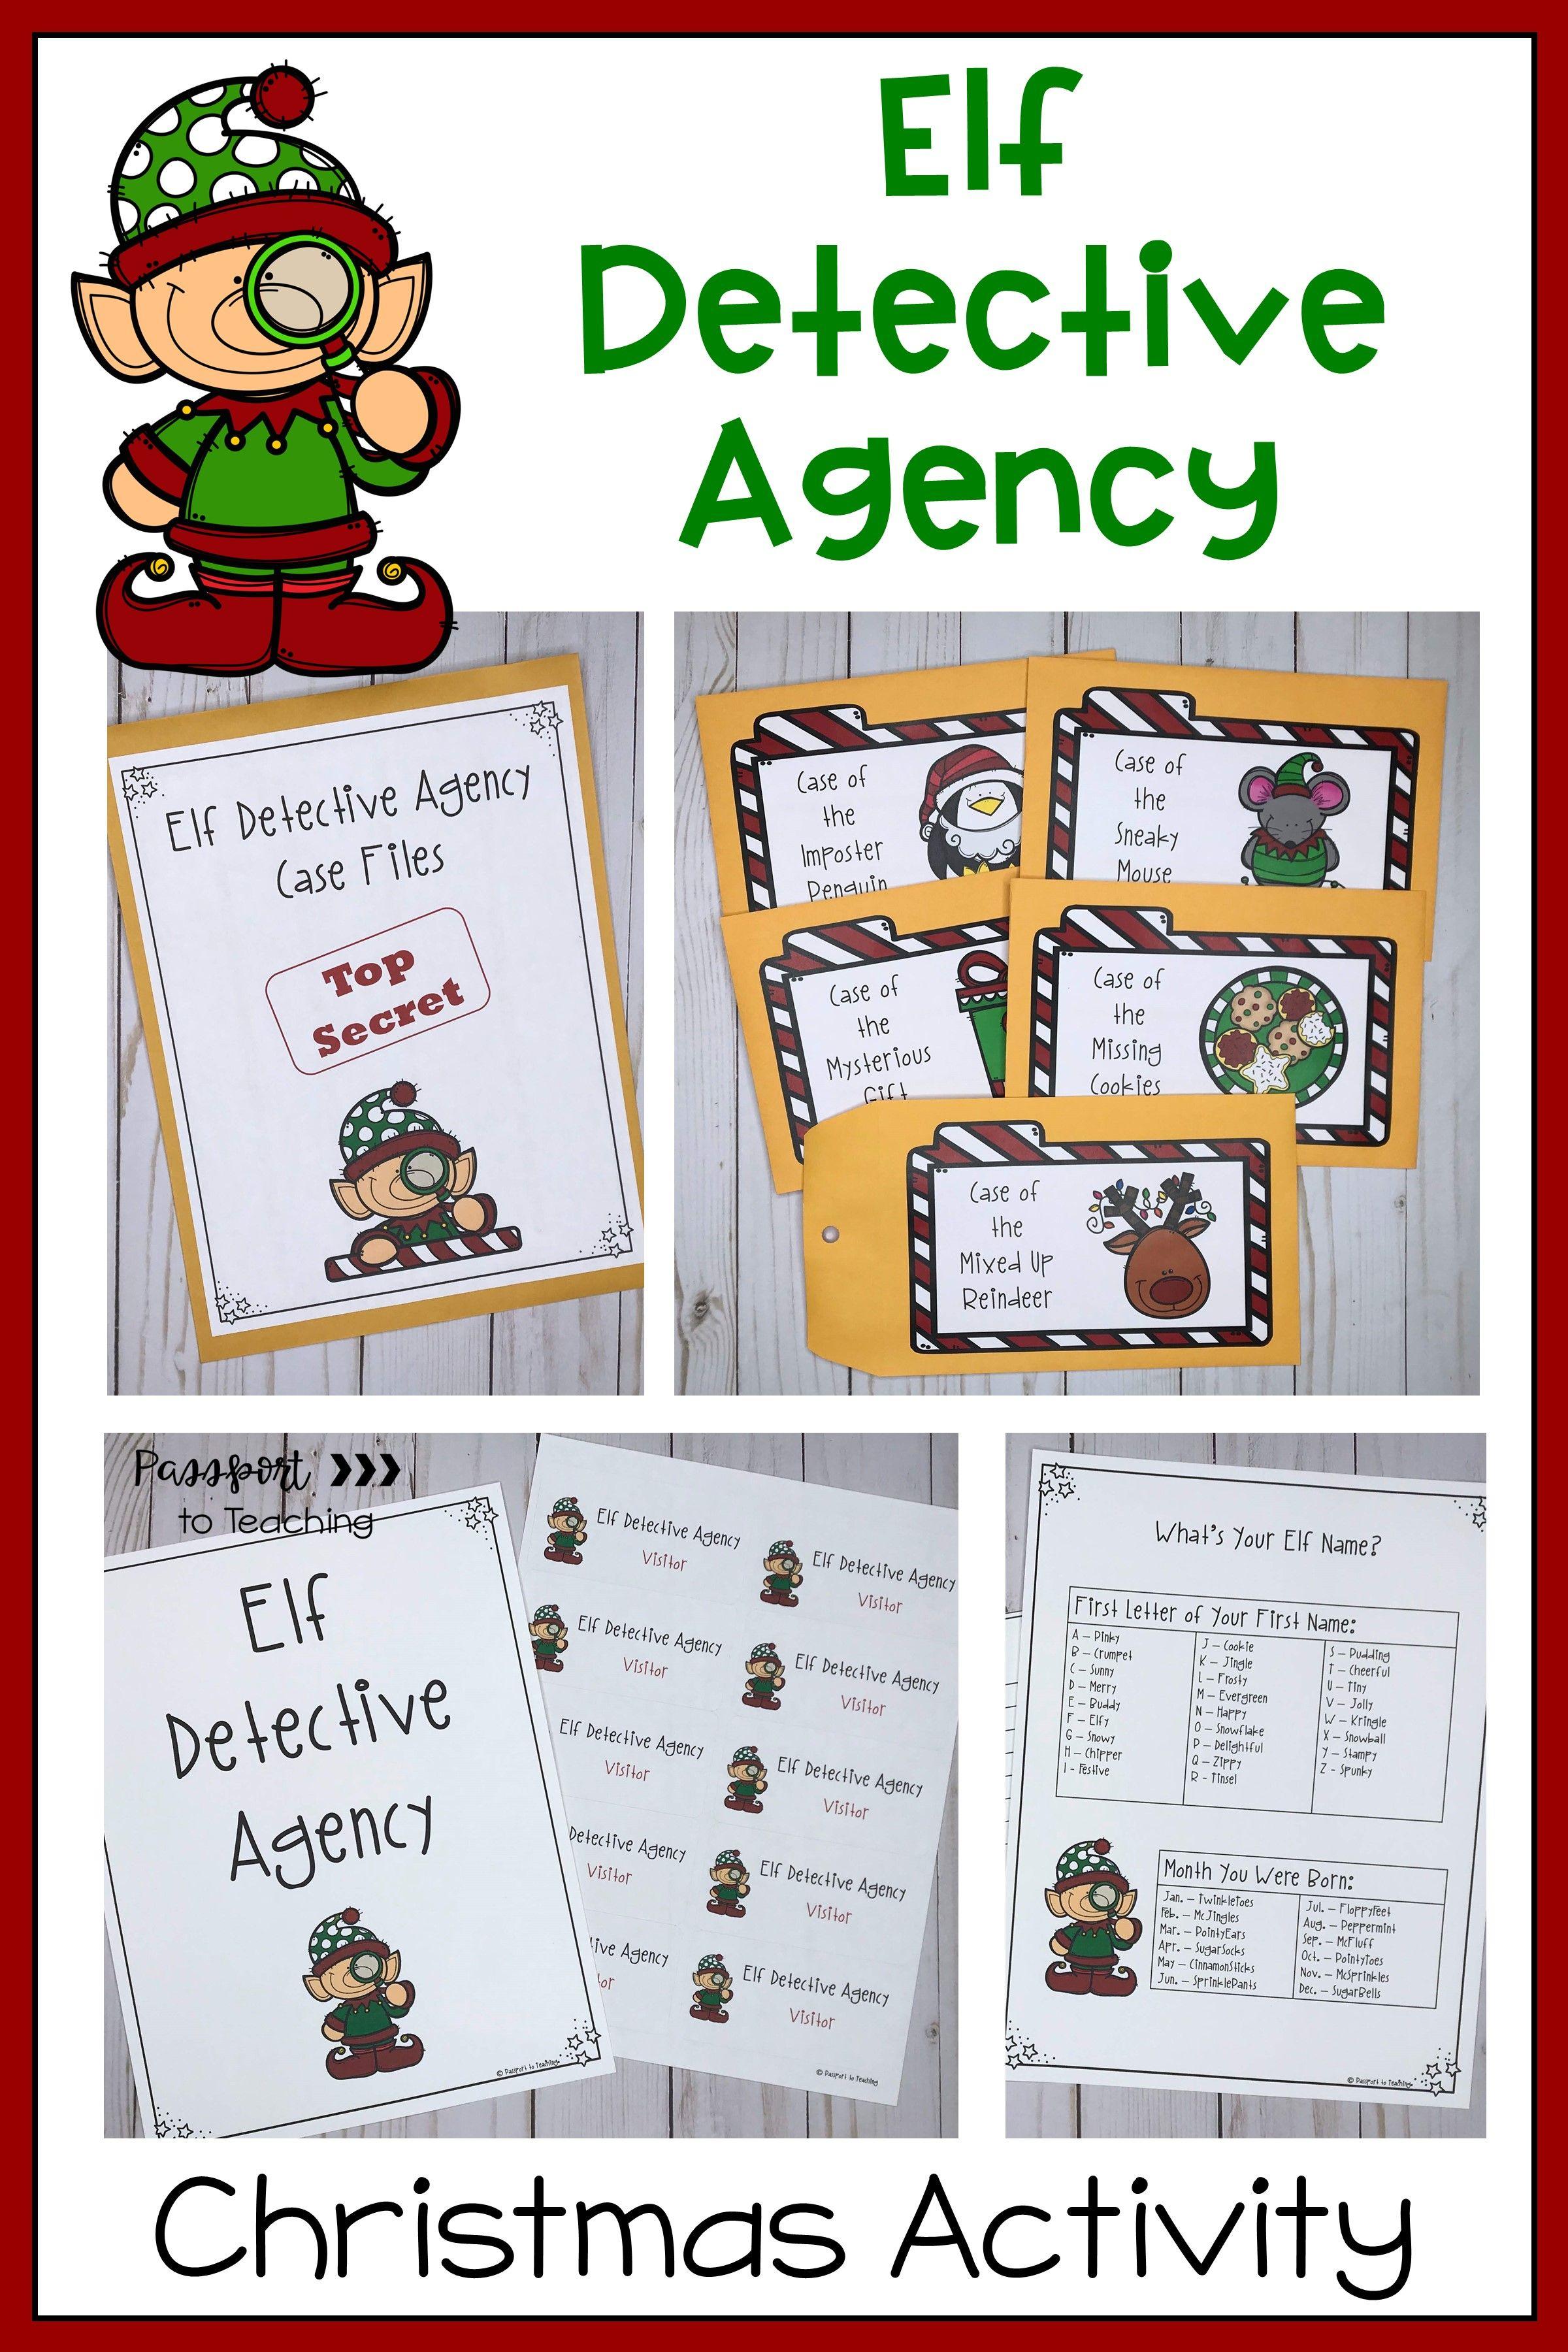 Elf Detective Agency Christmas Activity